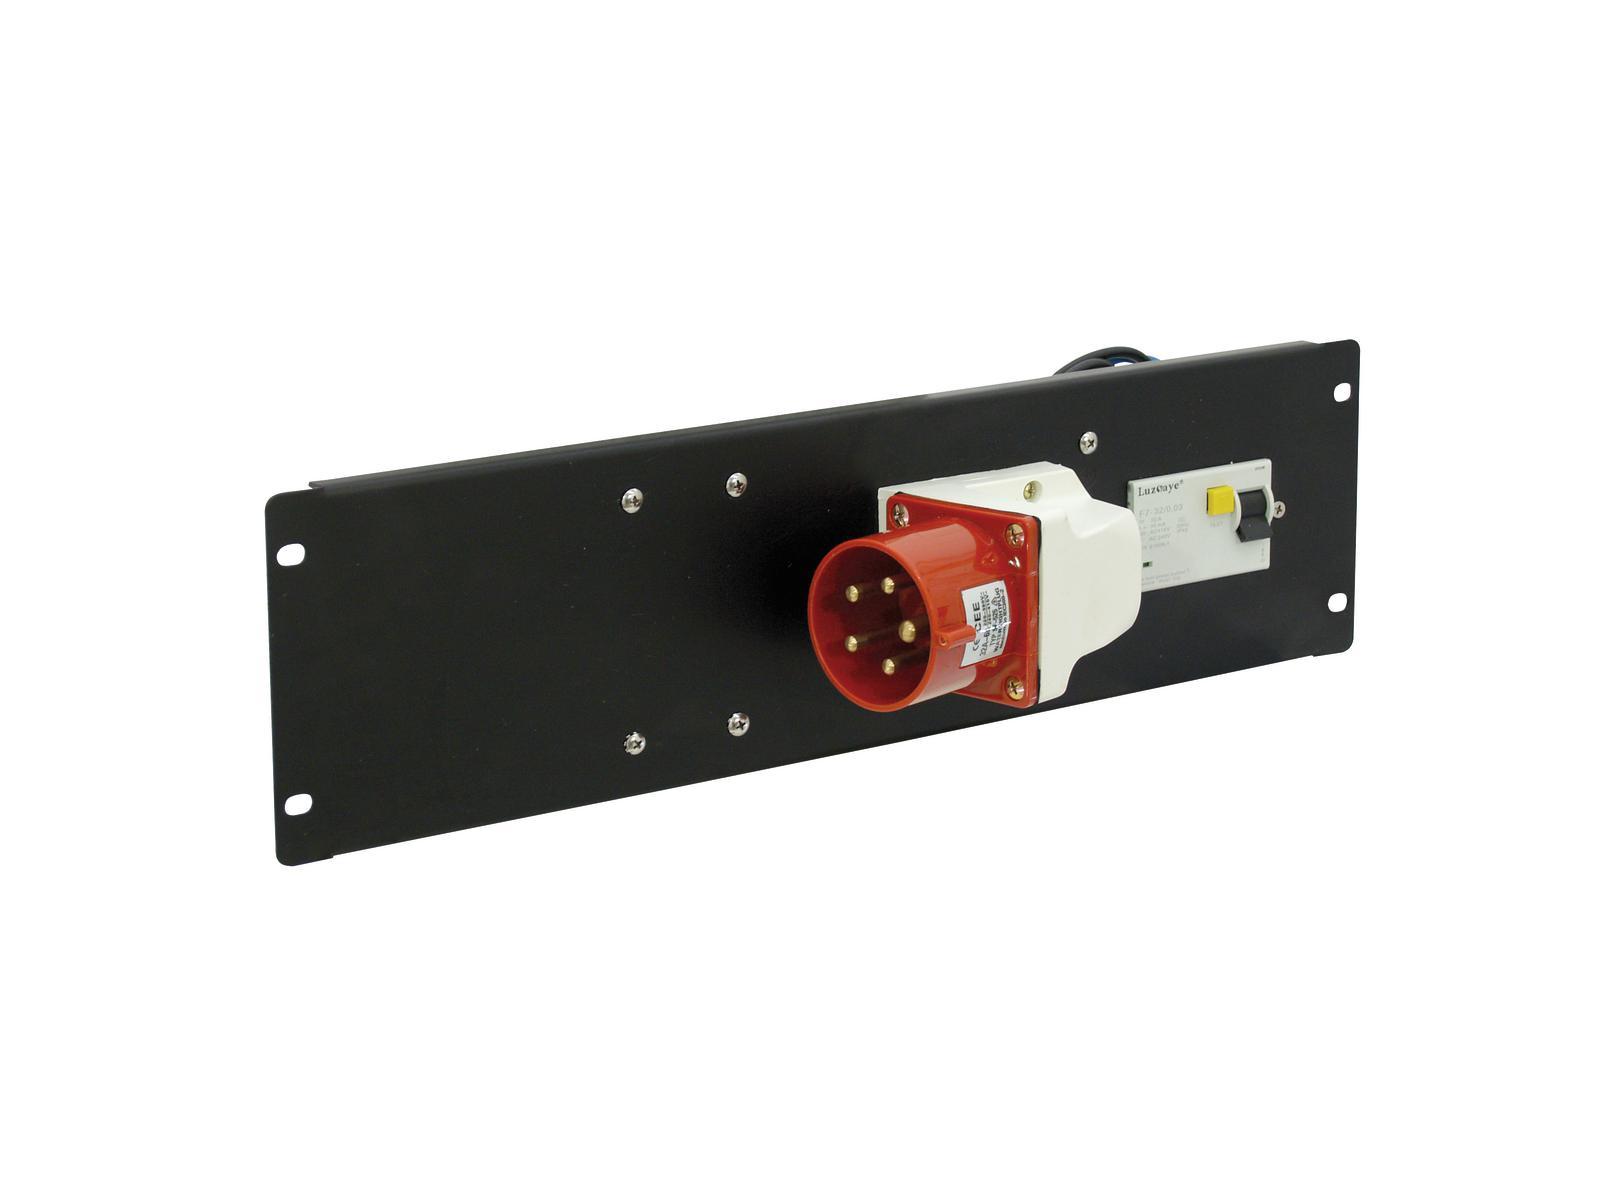 Power distributor EUROLITE with 1 socket CEE 32 A, 5 pin